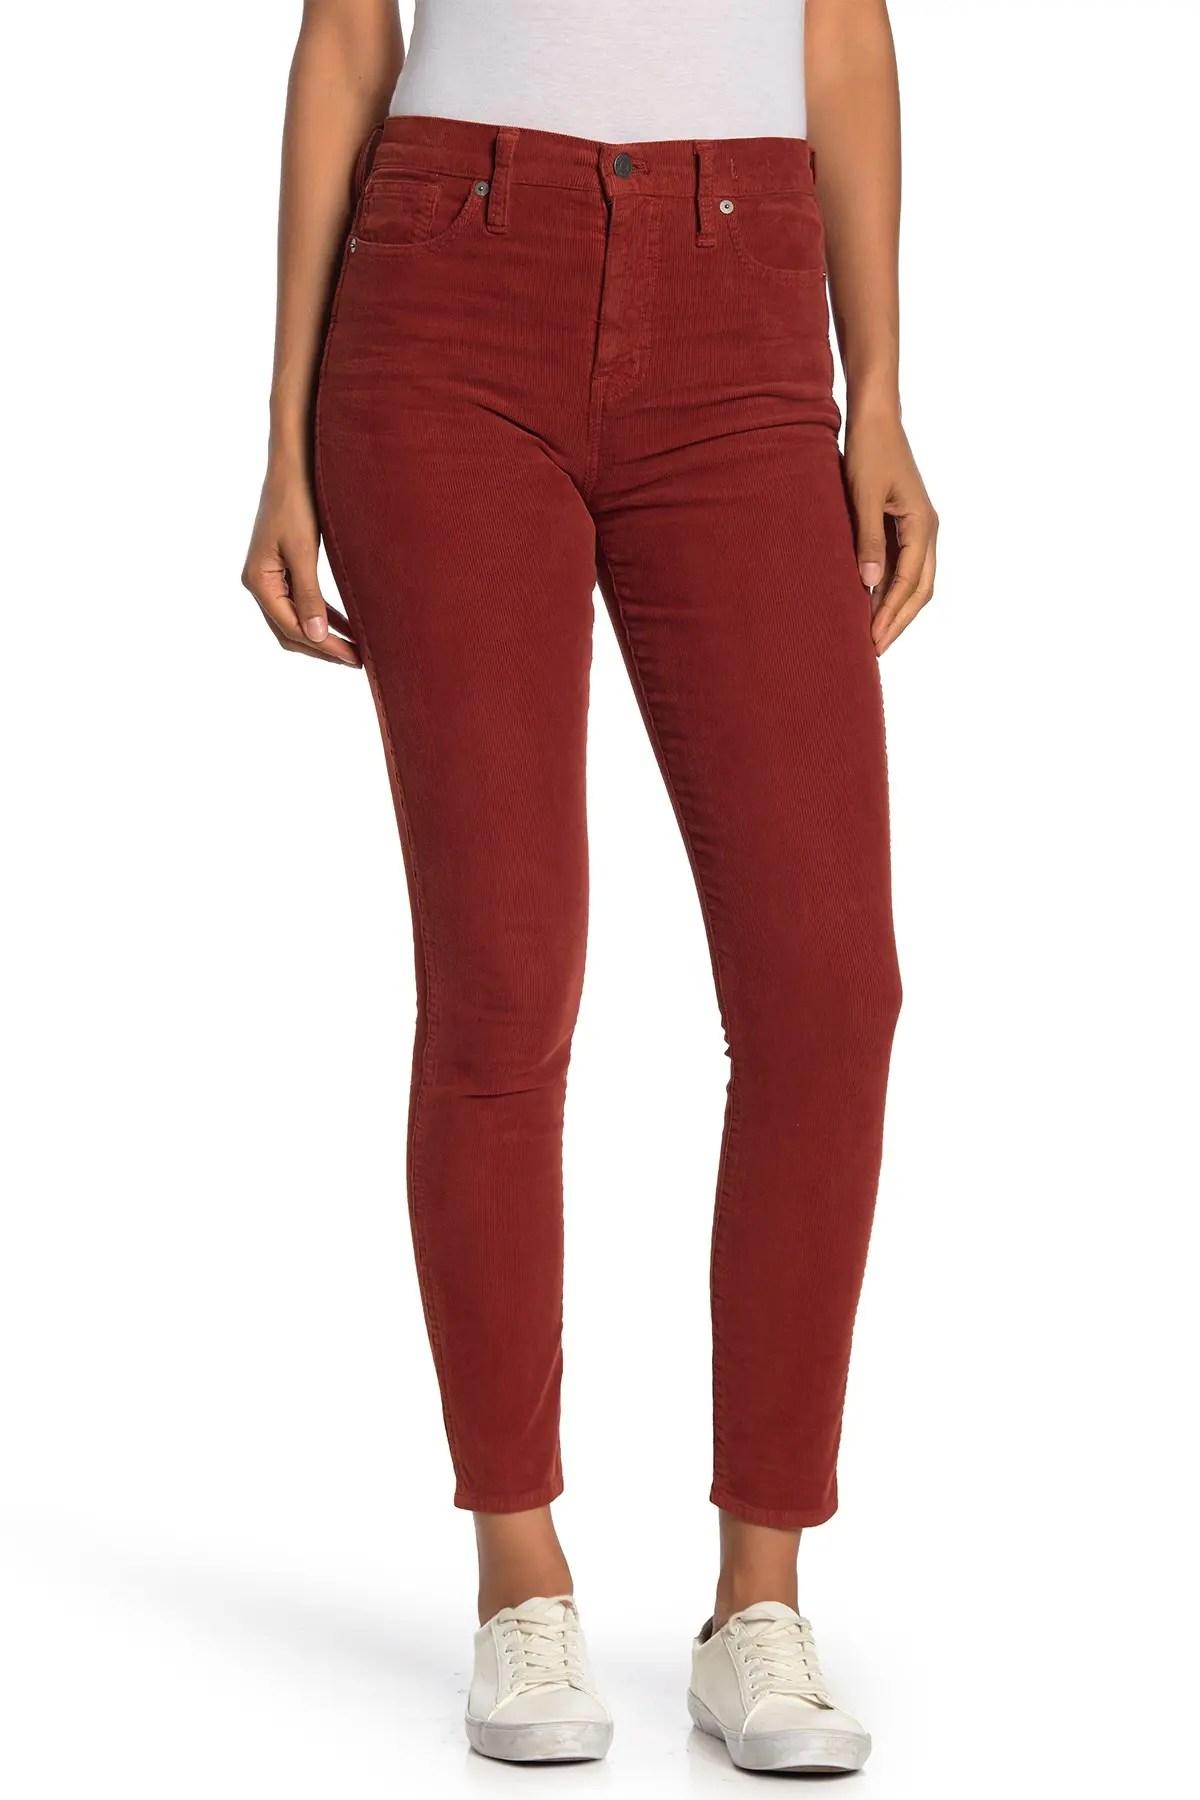 madewell high rise corduroy crop skinny jeans nordstrom rack